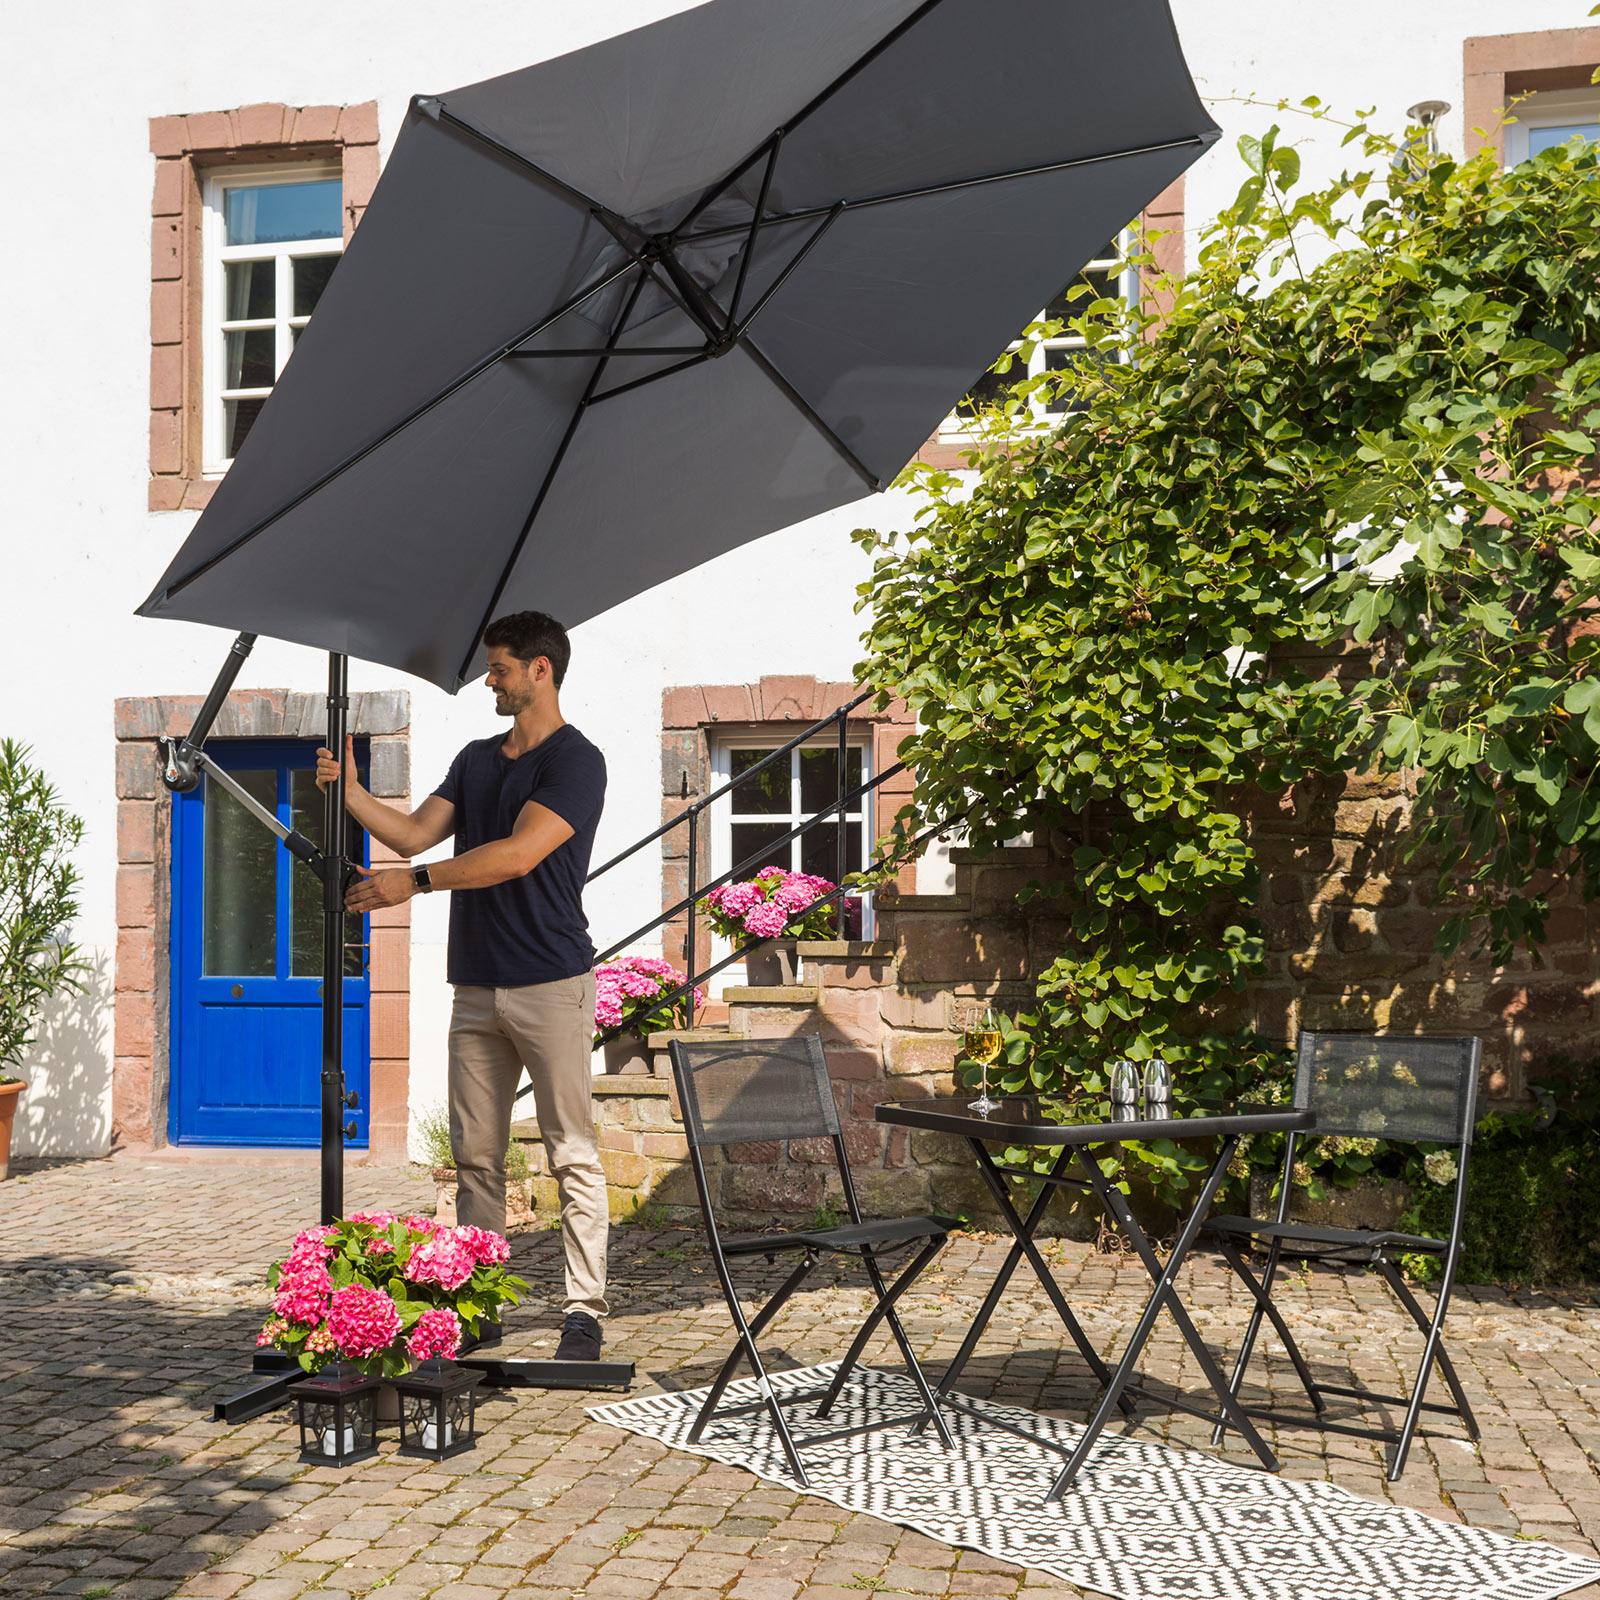 Gardiola Balkonmobel Set Schwarz Klappbar Online Bei Roller